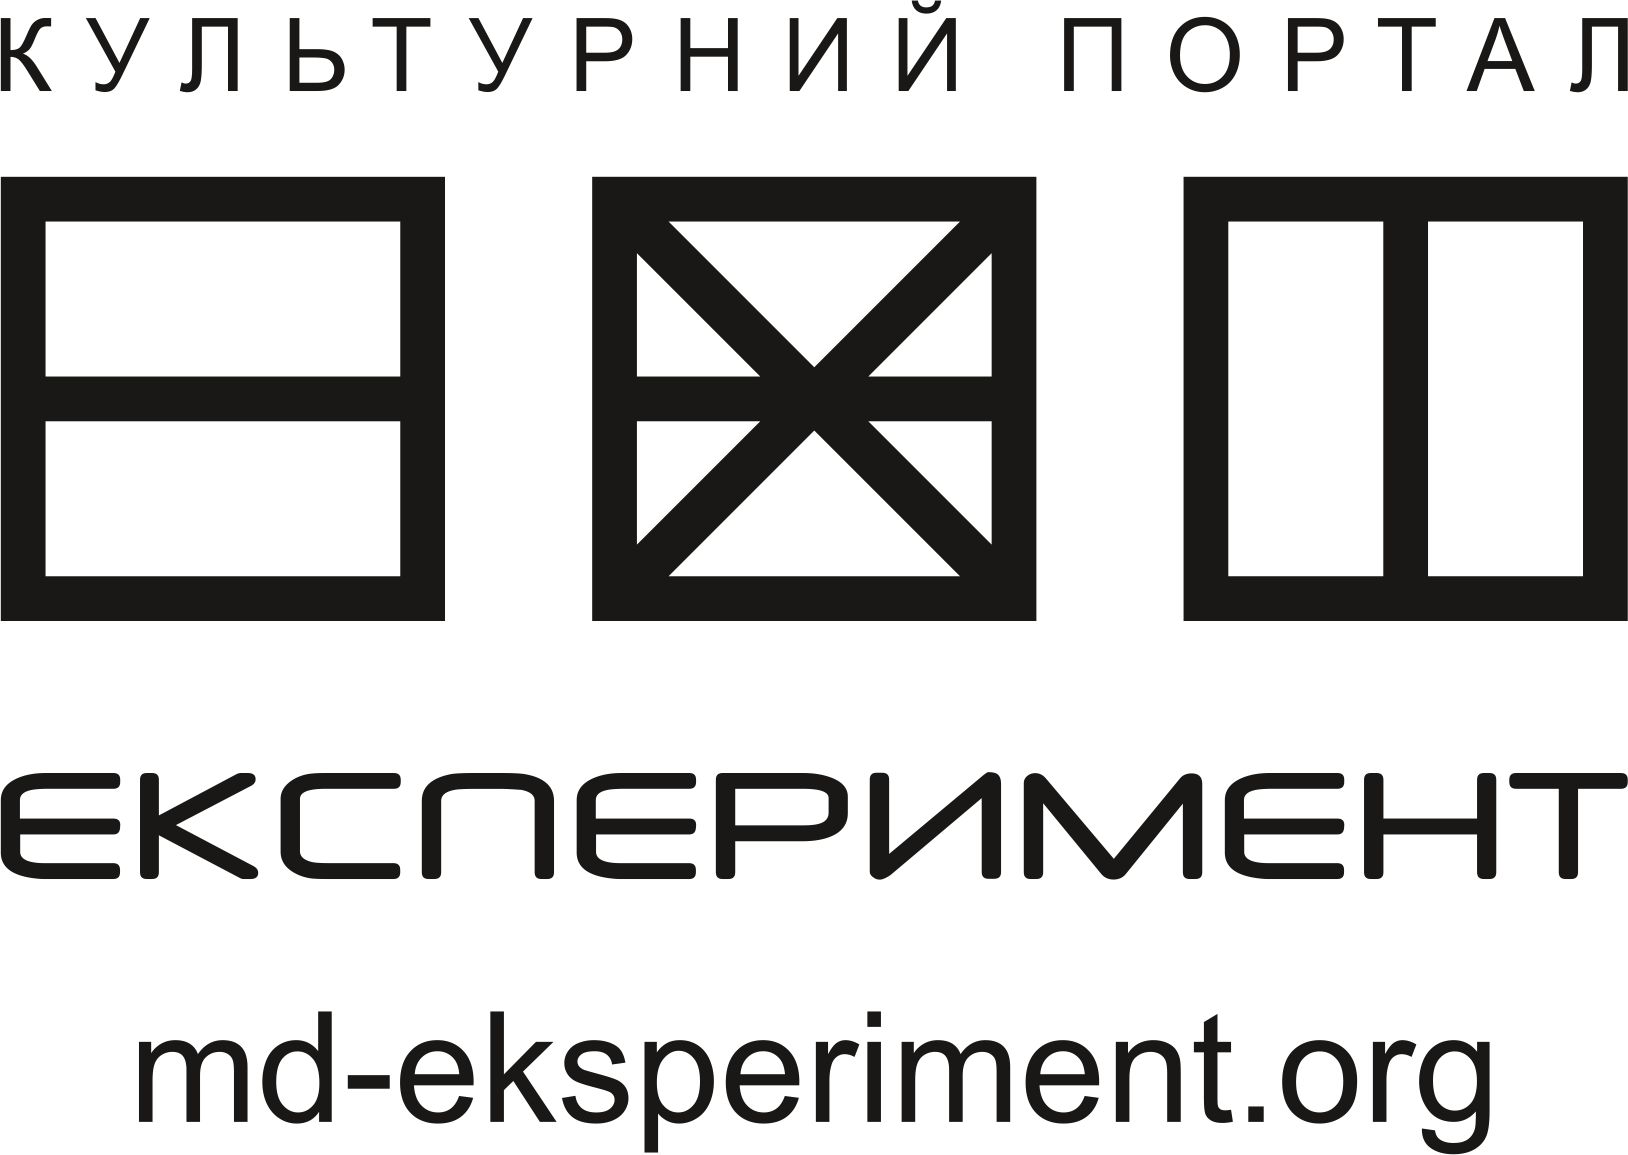 http://sergeylutsenkoart.com/wp-content/uploads/2017/02/md-eksperiment_prozracniy_poligraf.png